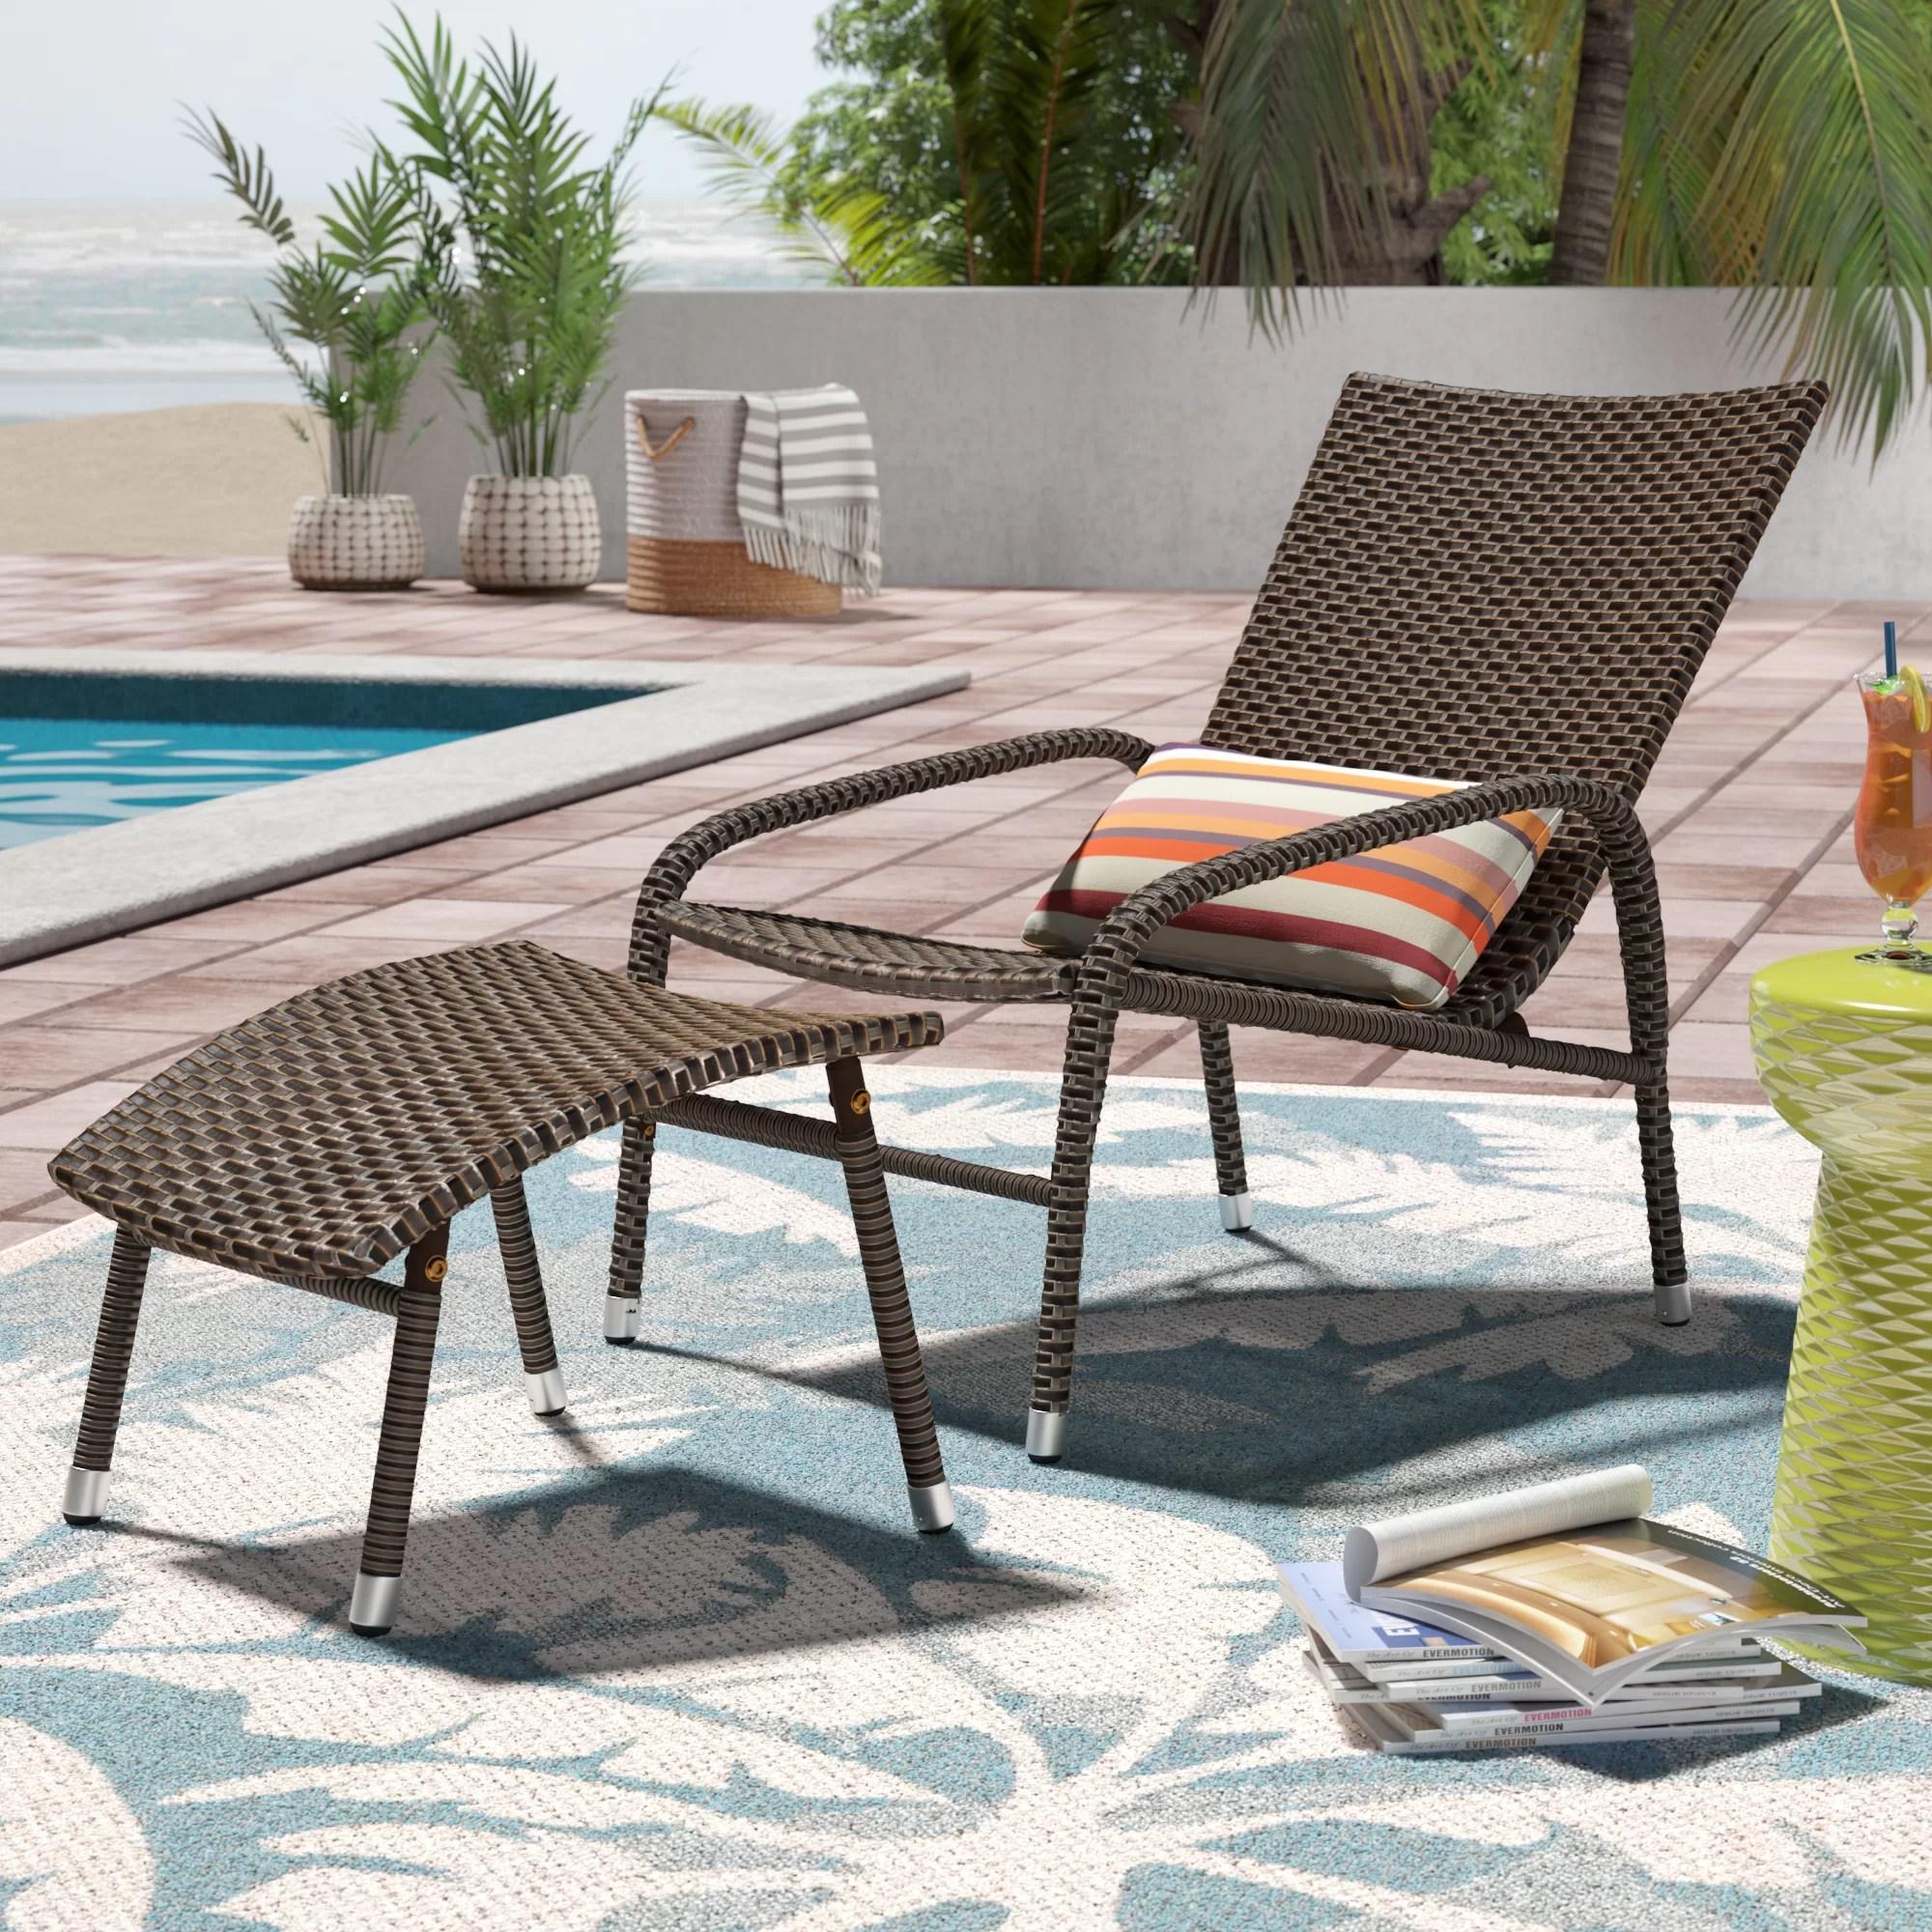 leanback lounger chairs one and a half chair sleeper mistana harmony lounge with ottoman reviews wayfair